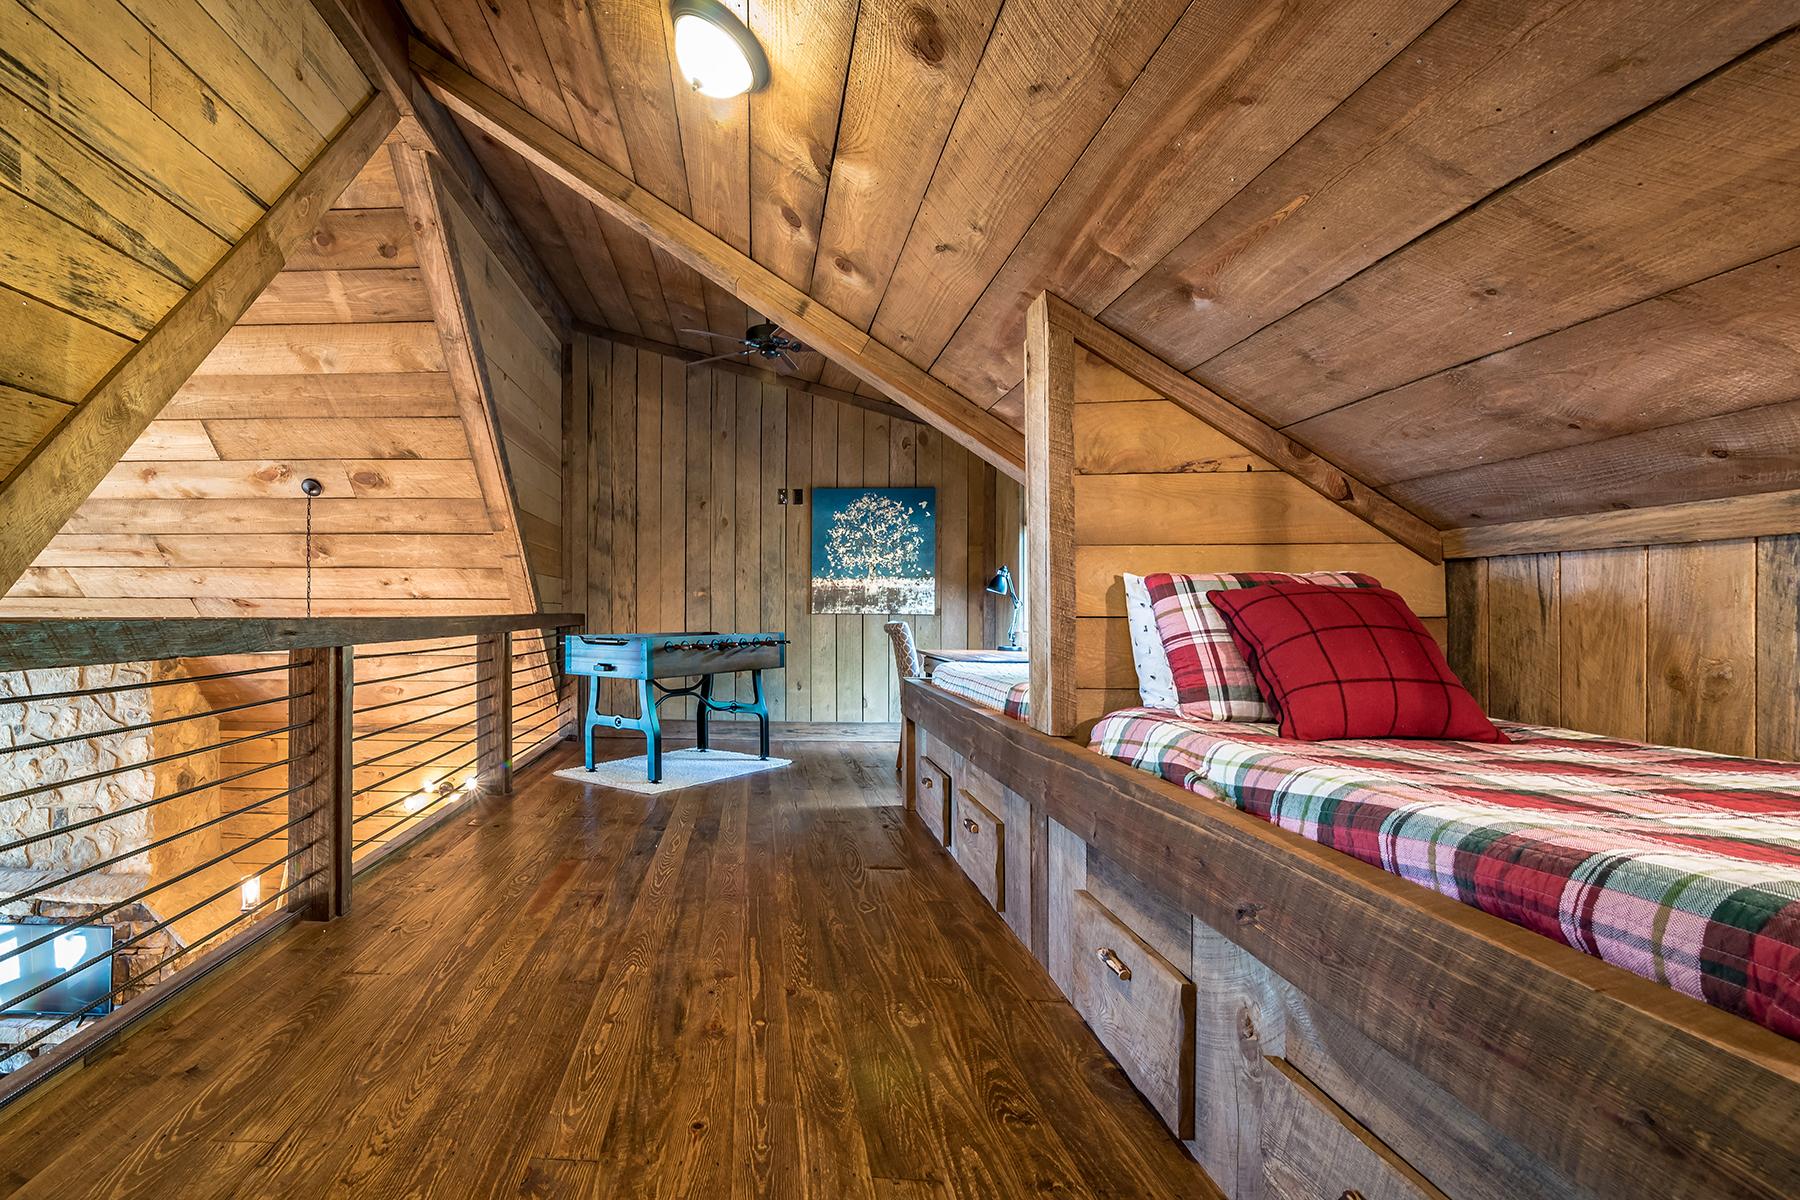 Additional photo for property listing at Stunning Blue Ridge Getaway 57 High Country Ln Morganton, Georgia 30560 United States